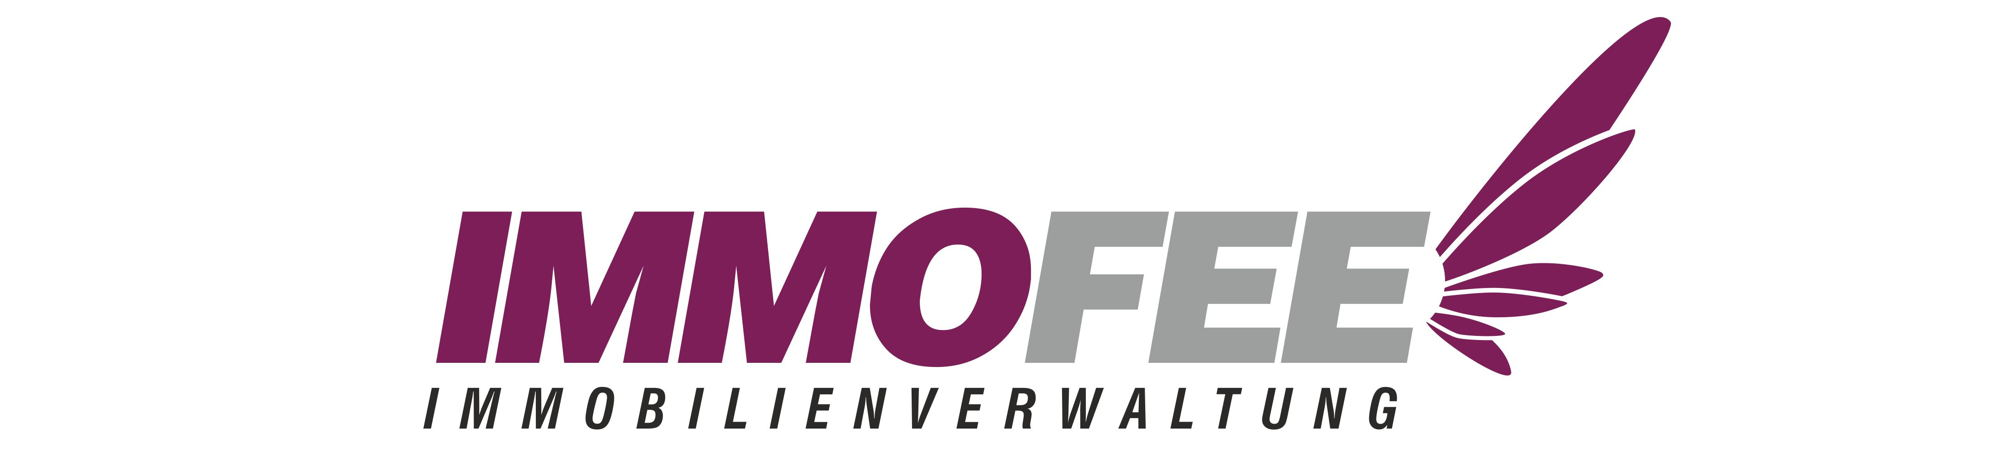 Immobilienverwaltung Wuppertal ImmoFee